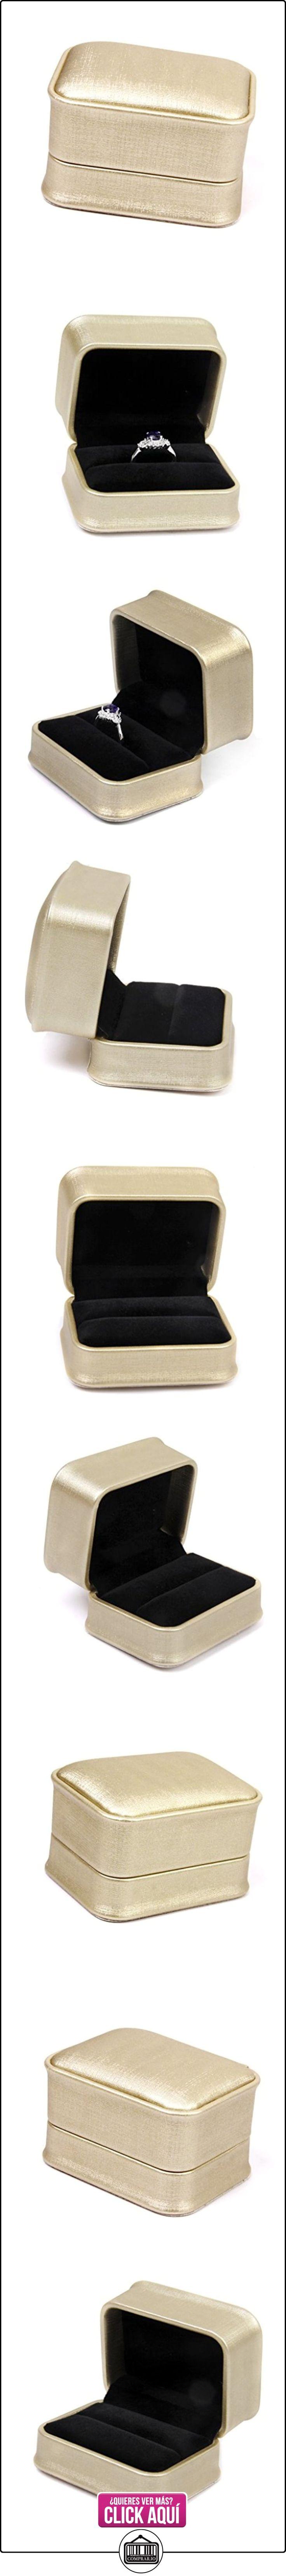 Caja Joyero de Anillo Funda Regalo Boda Fiesta Propuesta Romántico Retánculo Oro  ✿ Joyas para mujer - Las mejores ofertas ✿ ▬► Ver oferta: https://comprar.io/goto/B00VFGH8SA